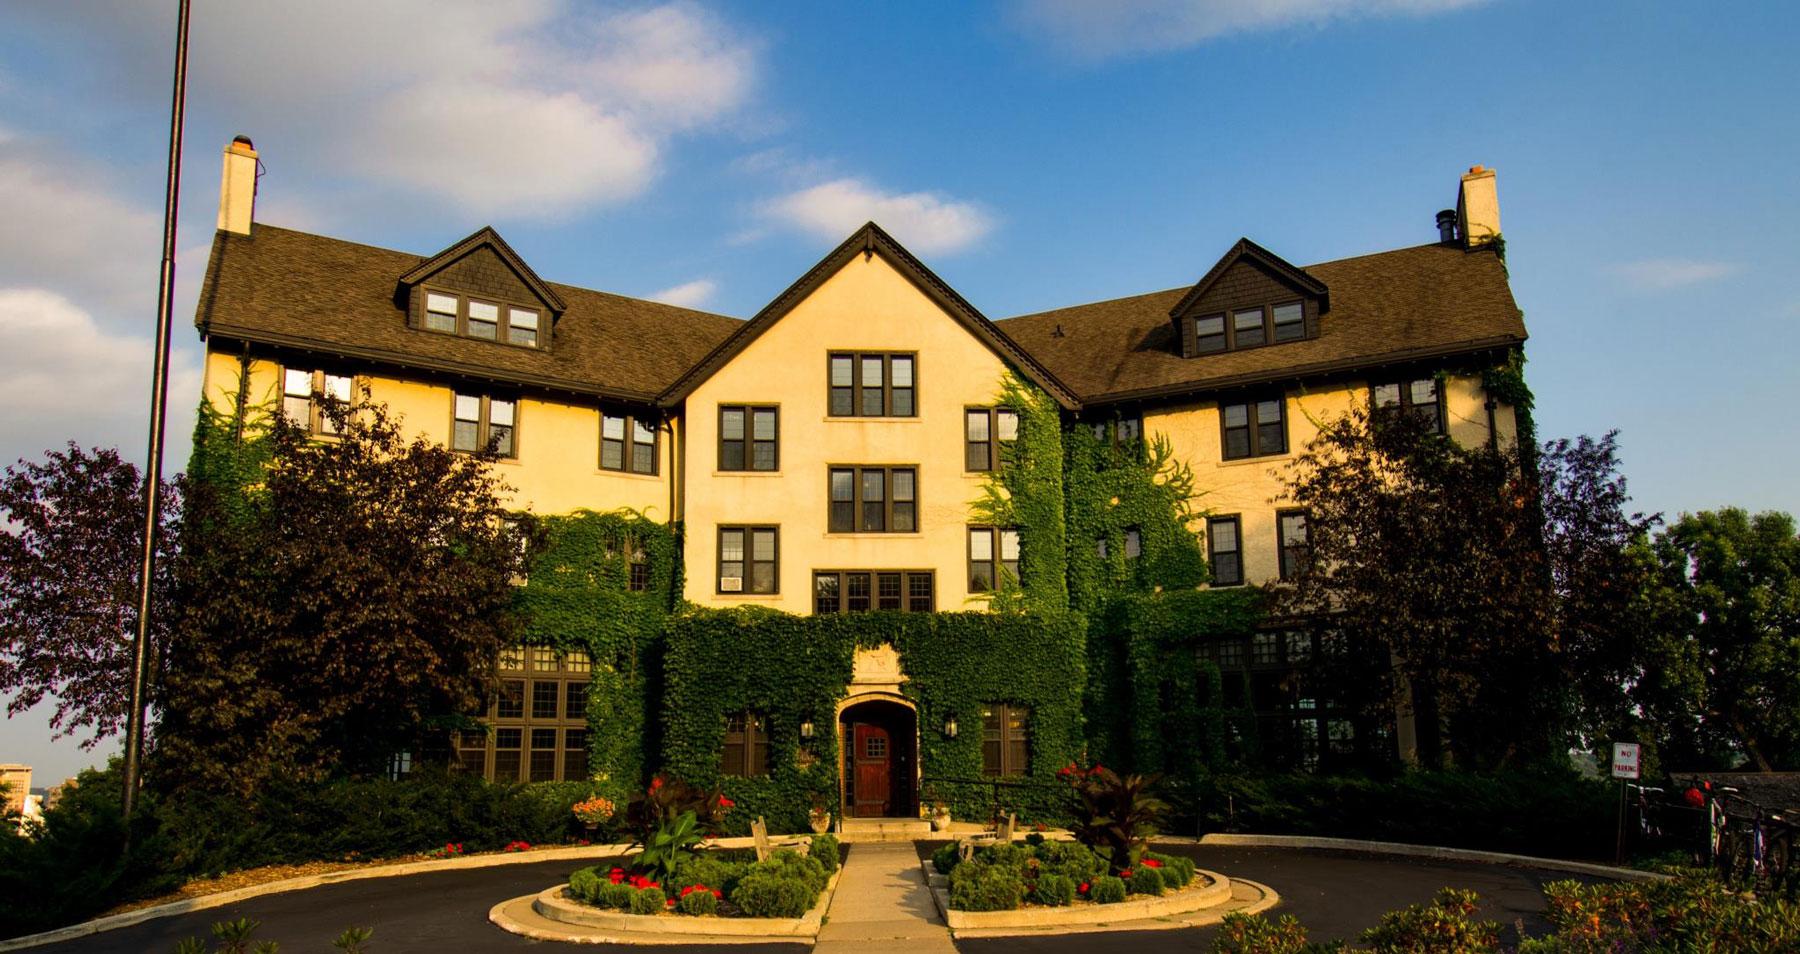 Spotlight on Tudor-Revival Architecture